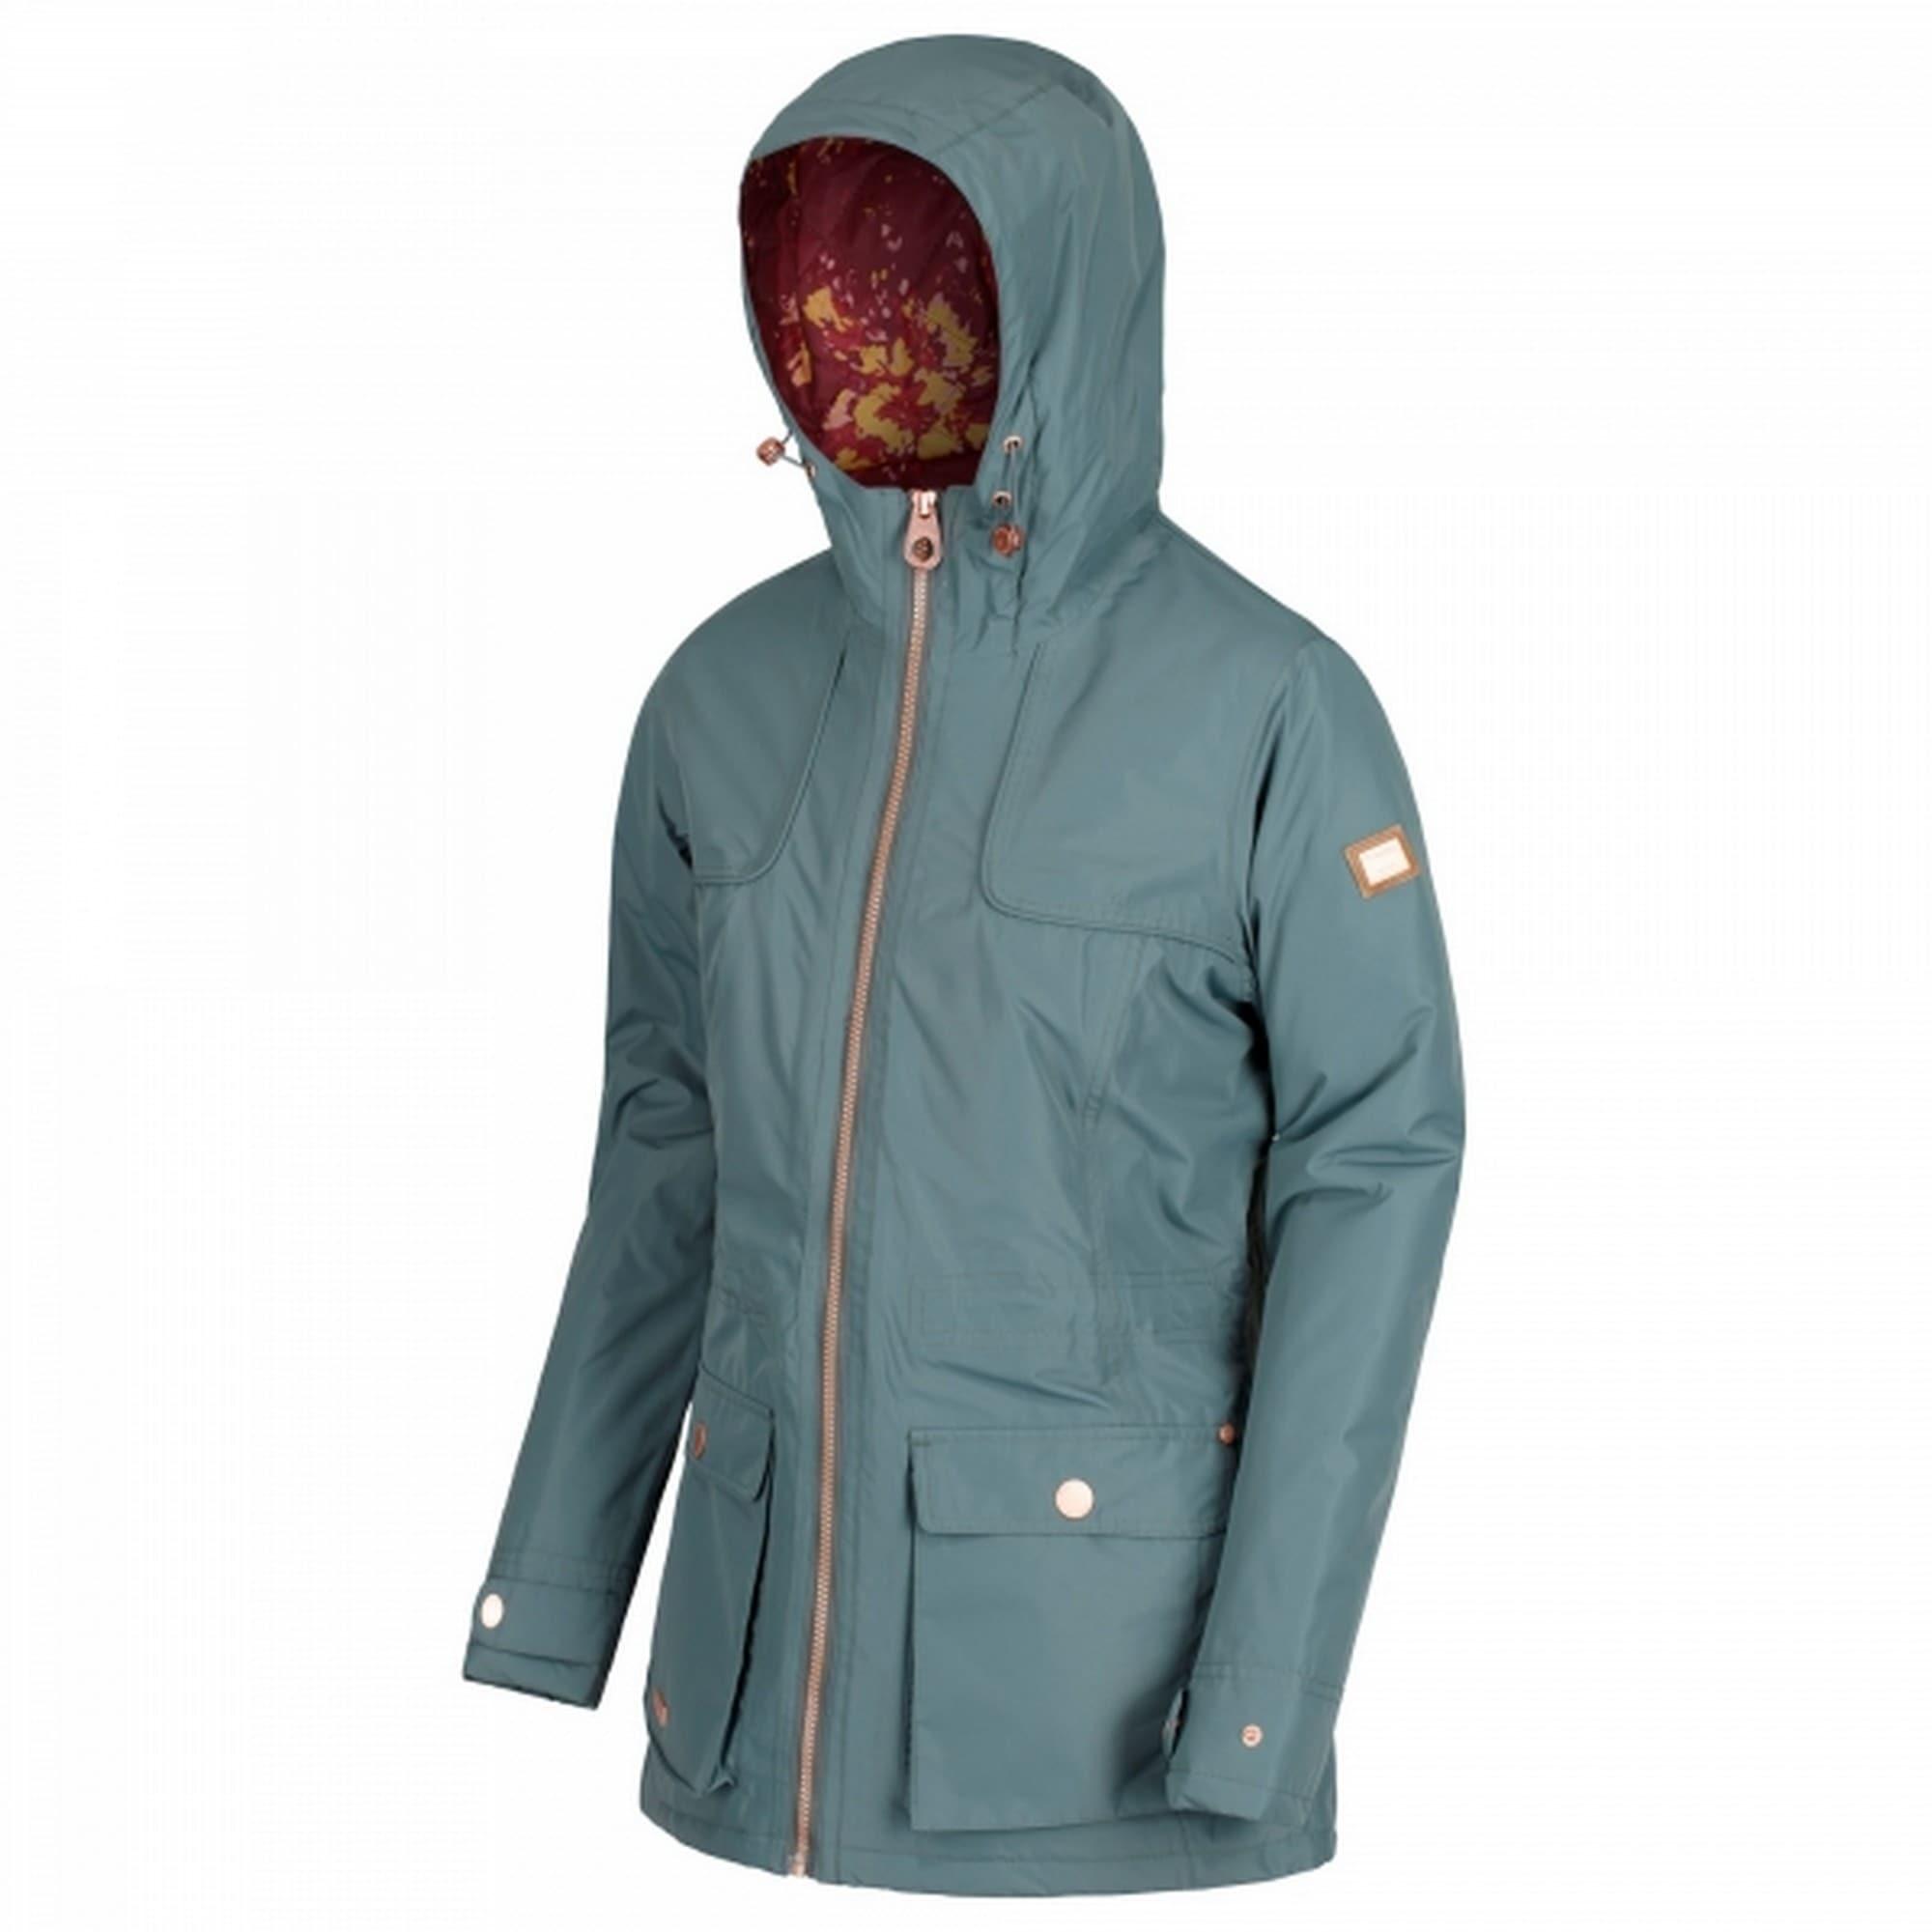 Regatta Outdoorjacke Damen Jacke Bechette mit Kapuze